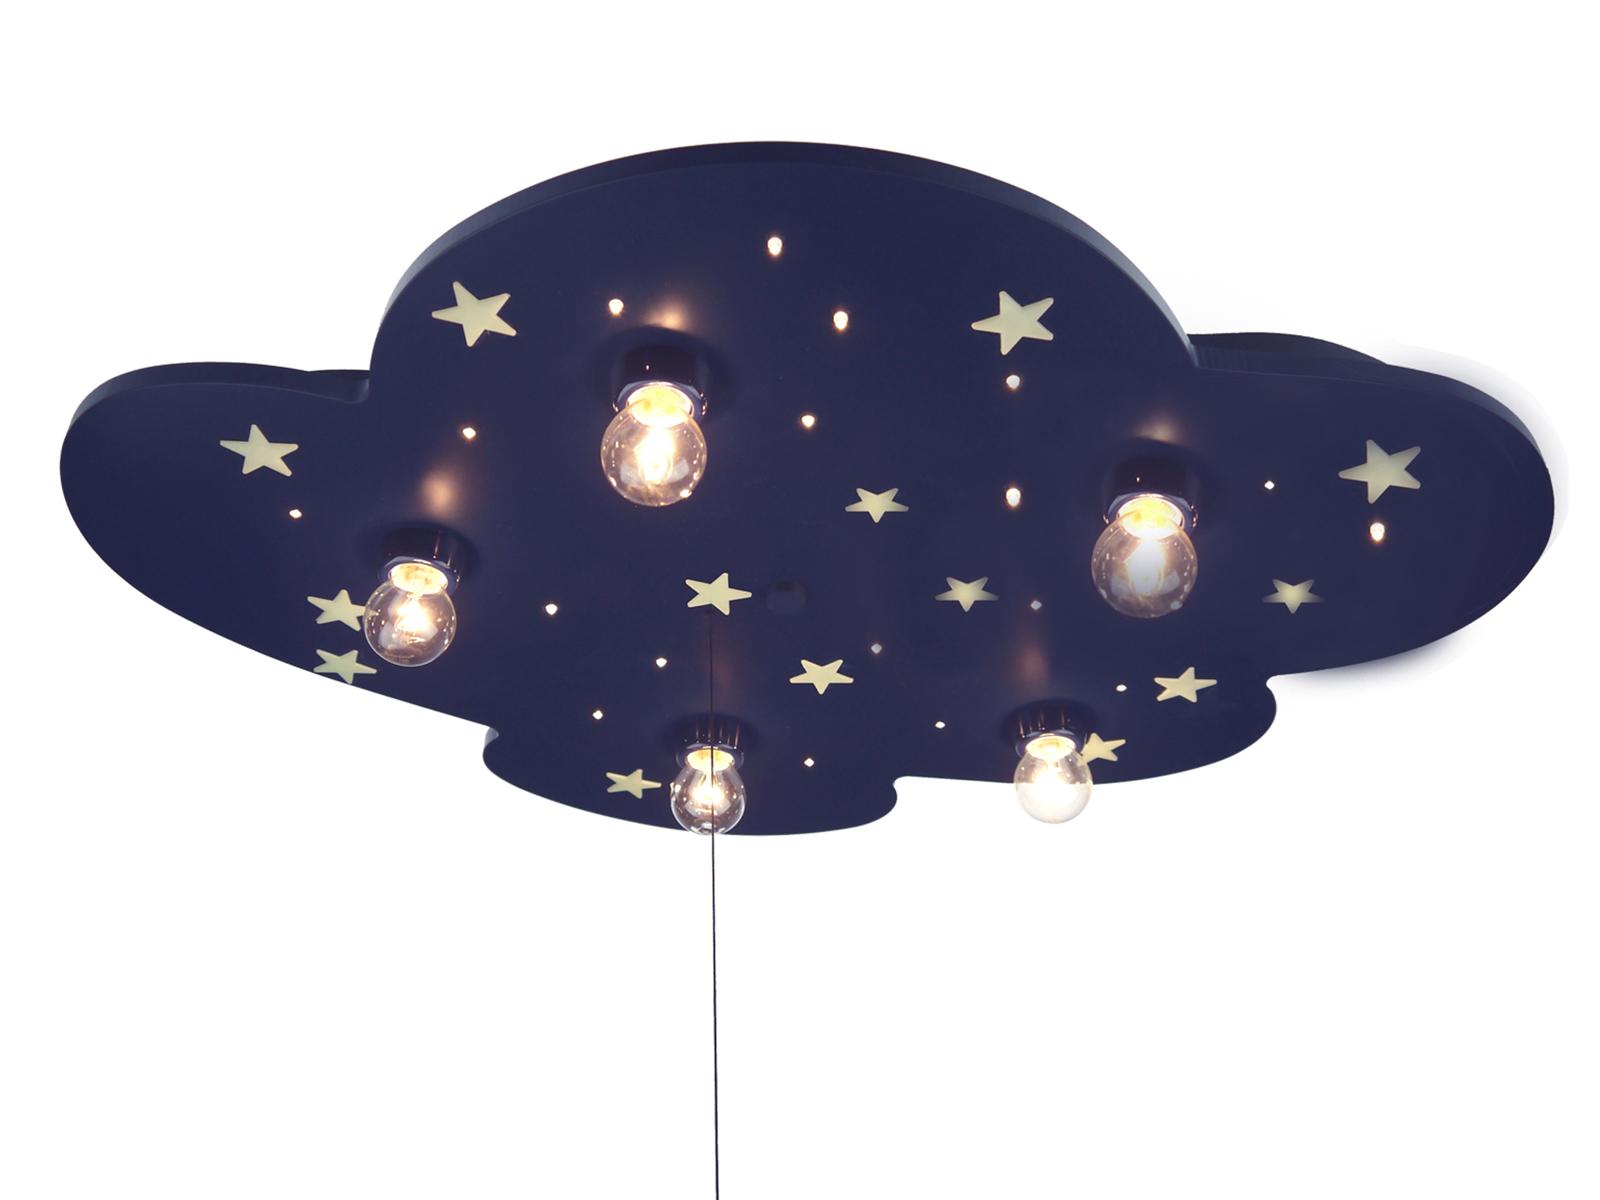 LED Deckenleuchte Kinderzimmer -ALEXA schalte Licht an- LED Sternenhimmel  *NEU*